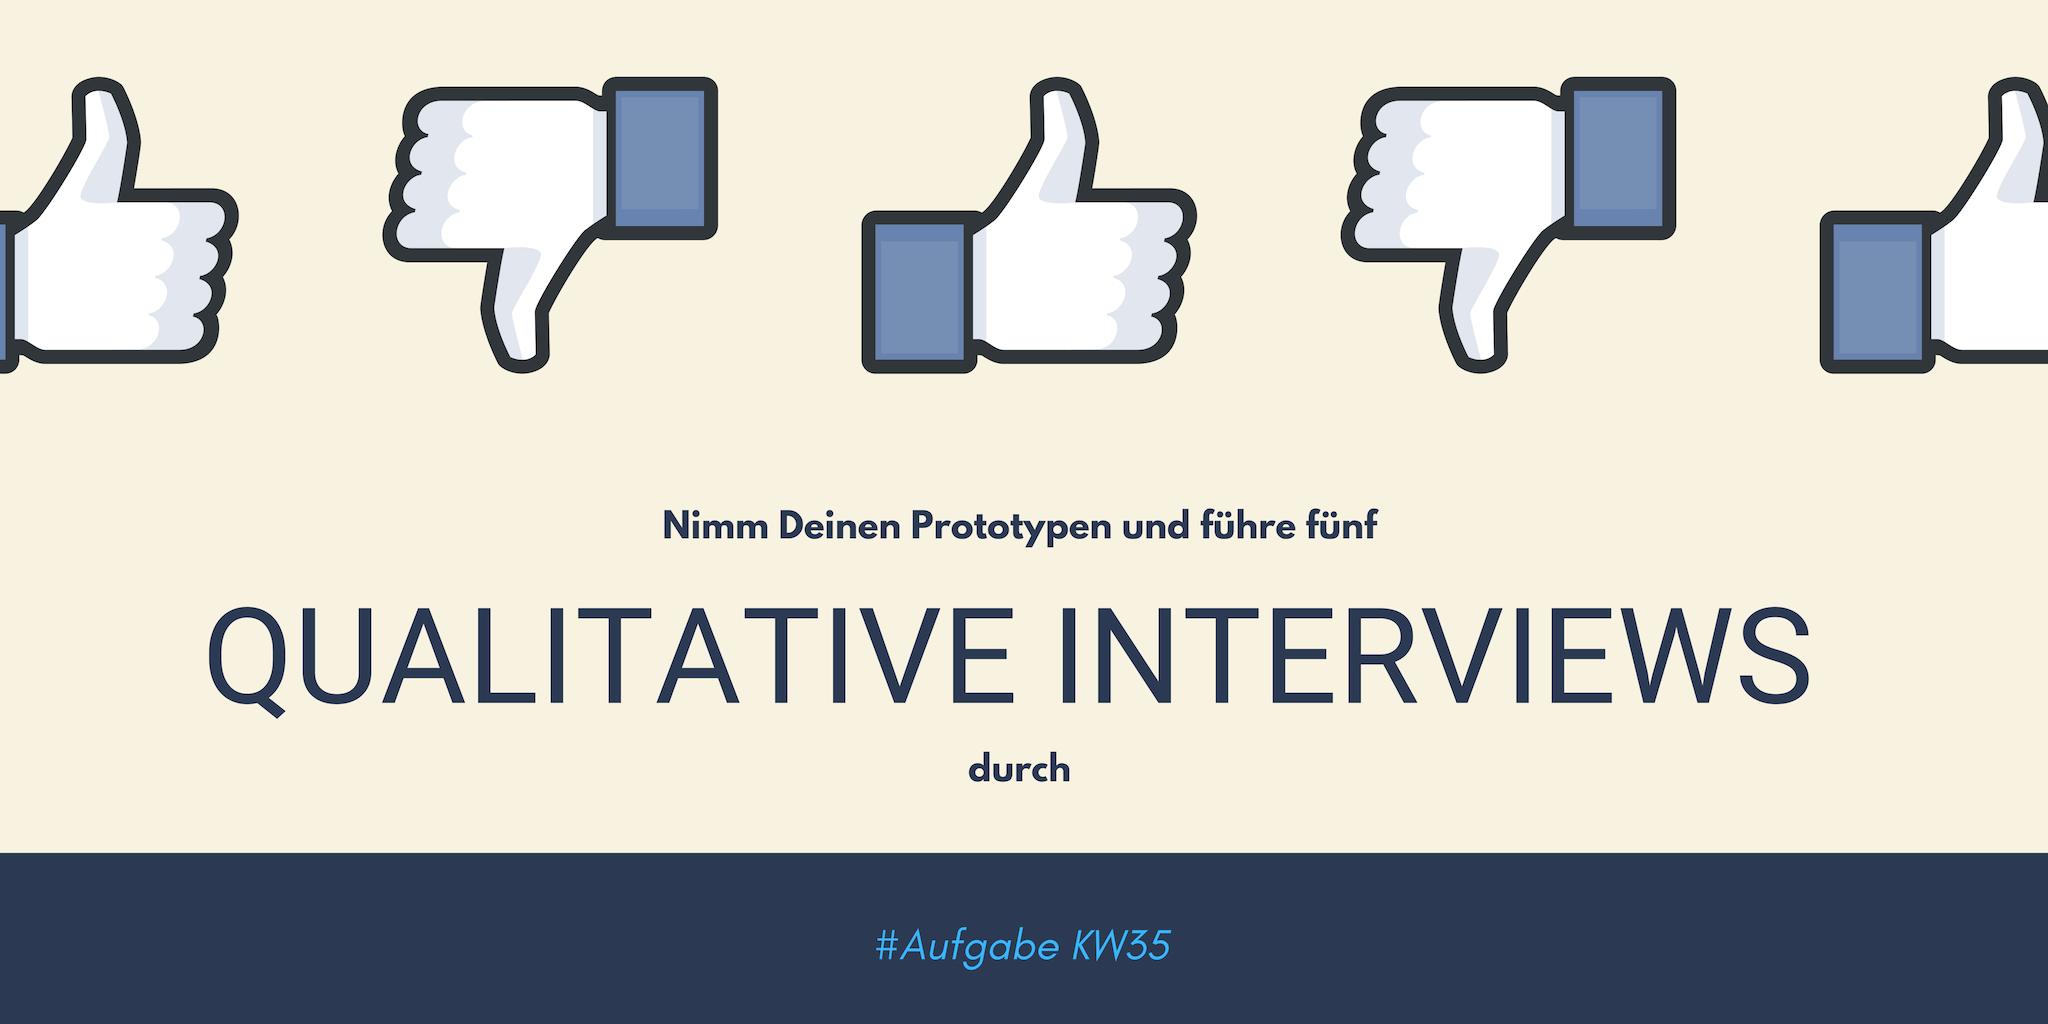 KW35 - Qualitative Intervies